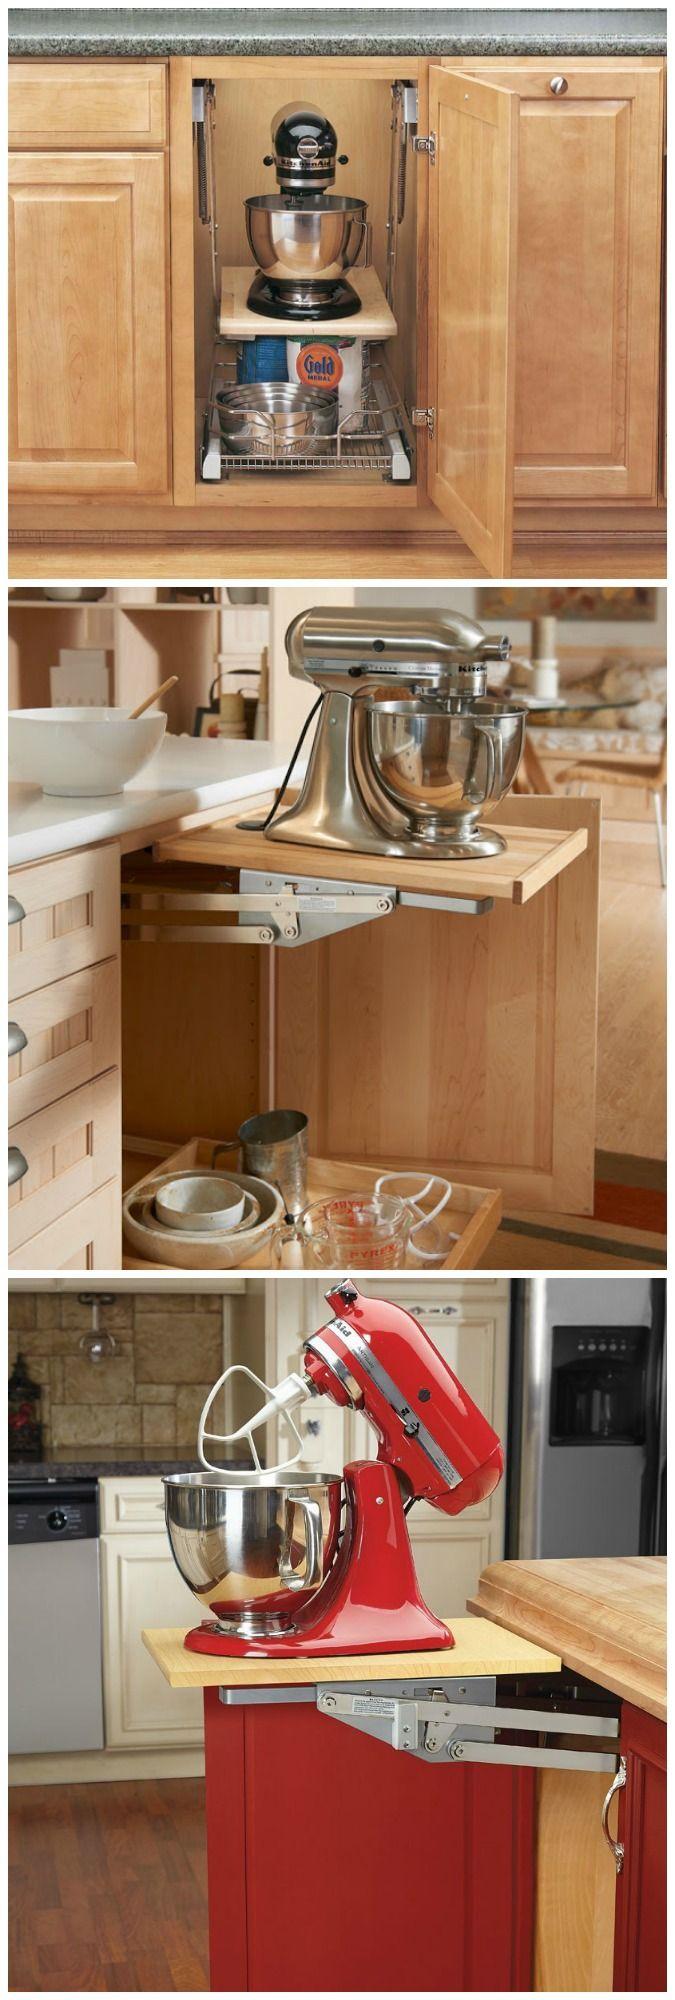 Küchendesign aluminium vlad dornean whlaadutzu on pinterest